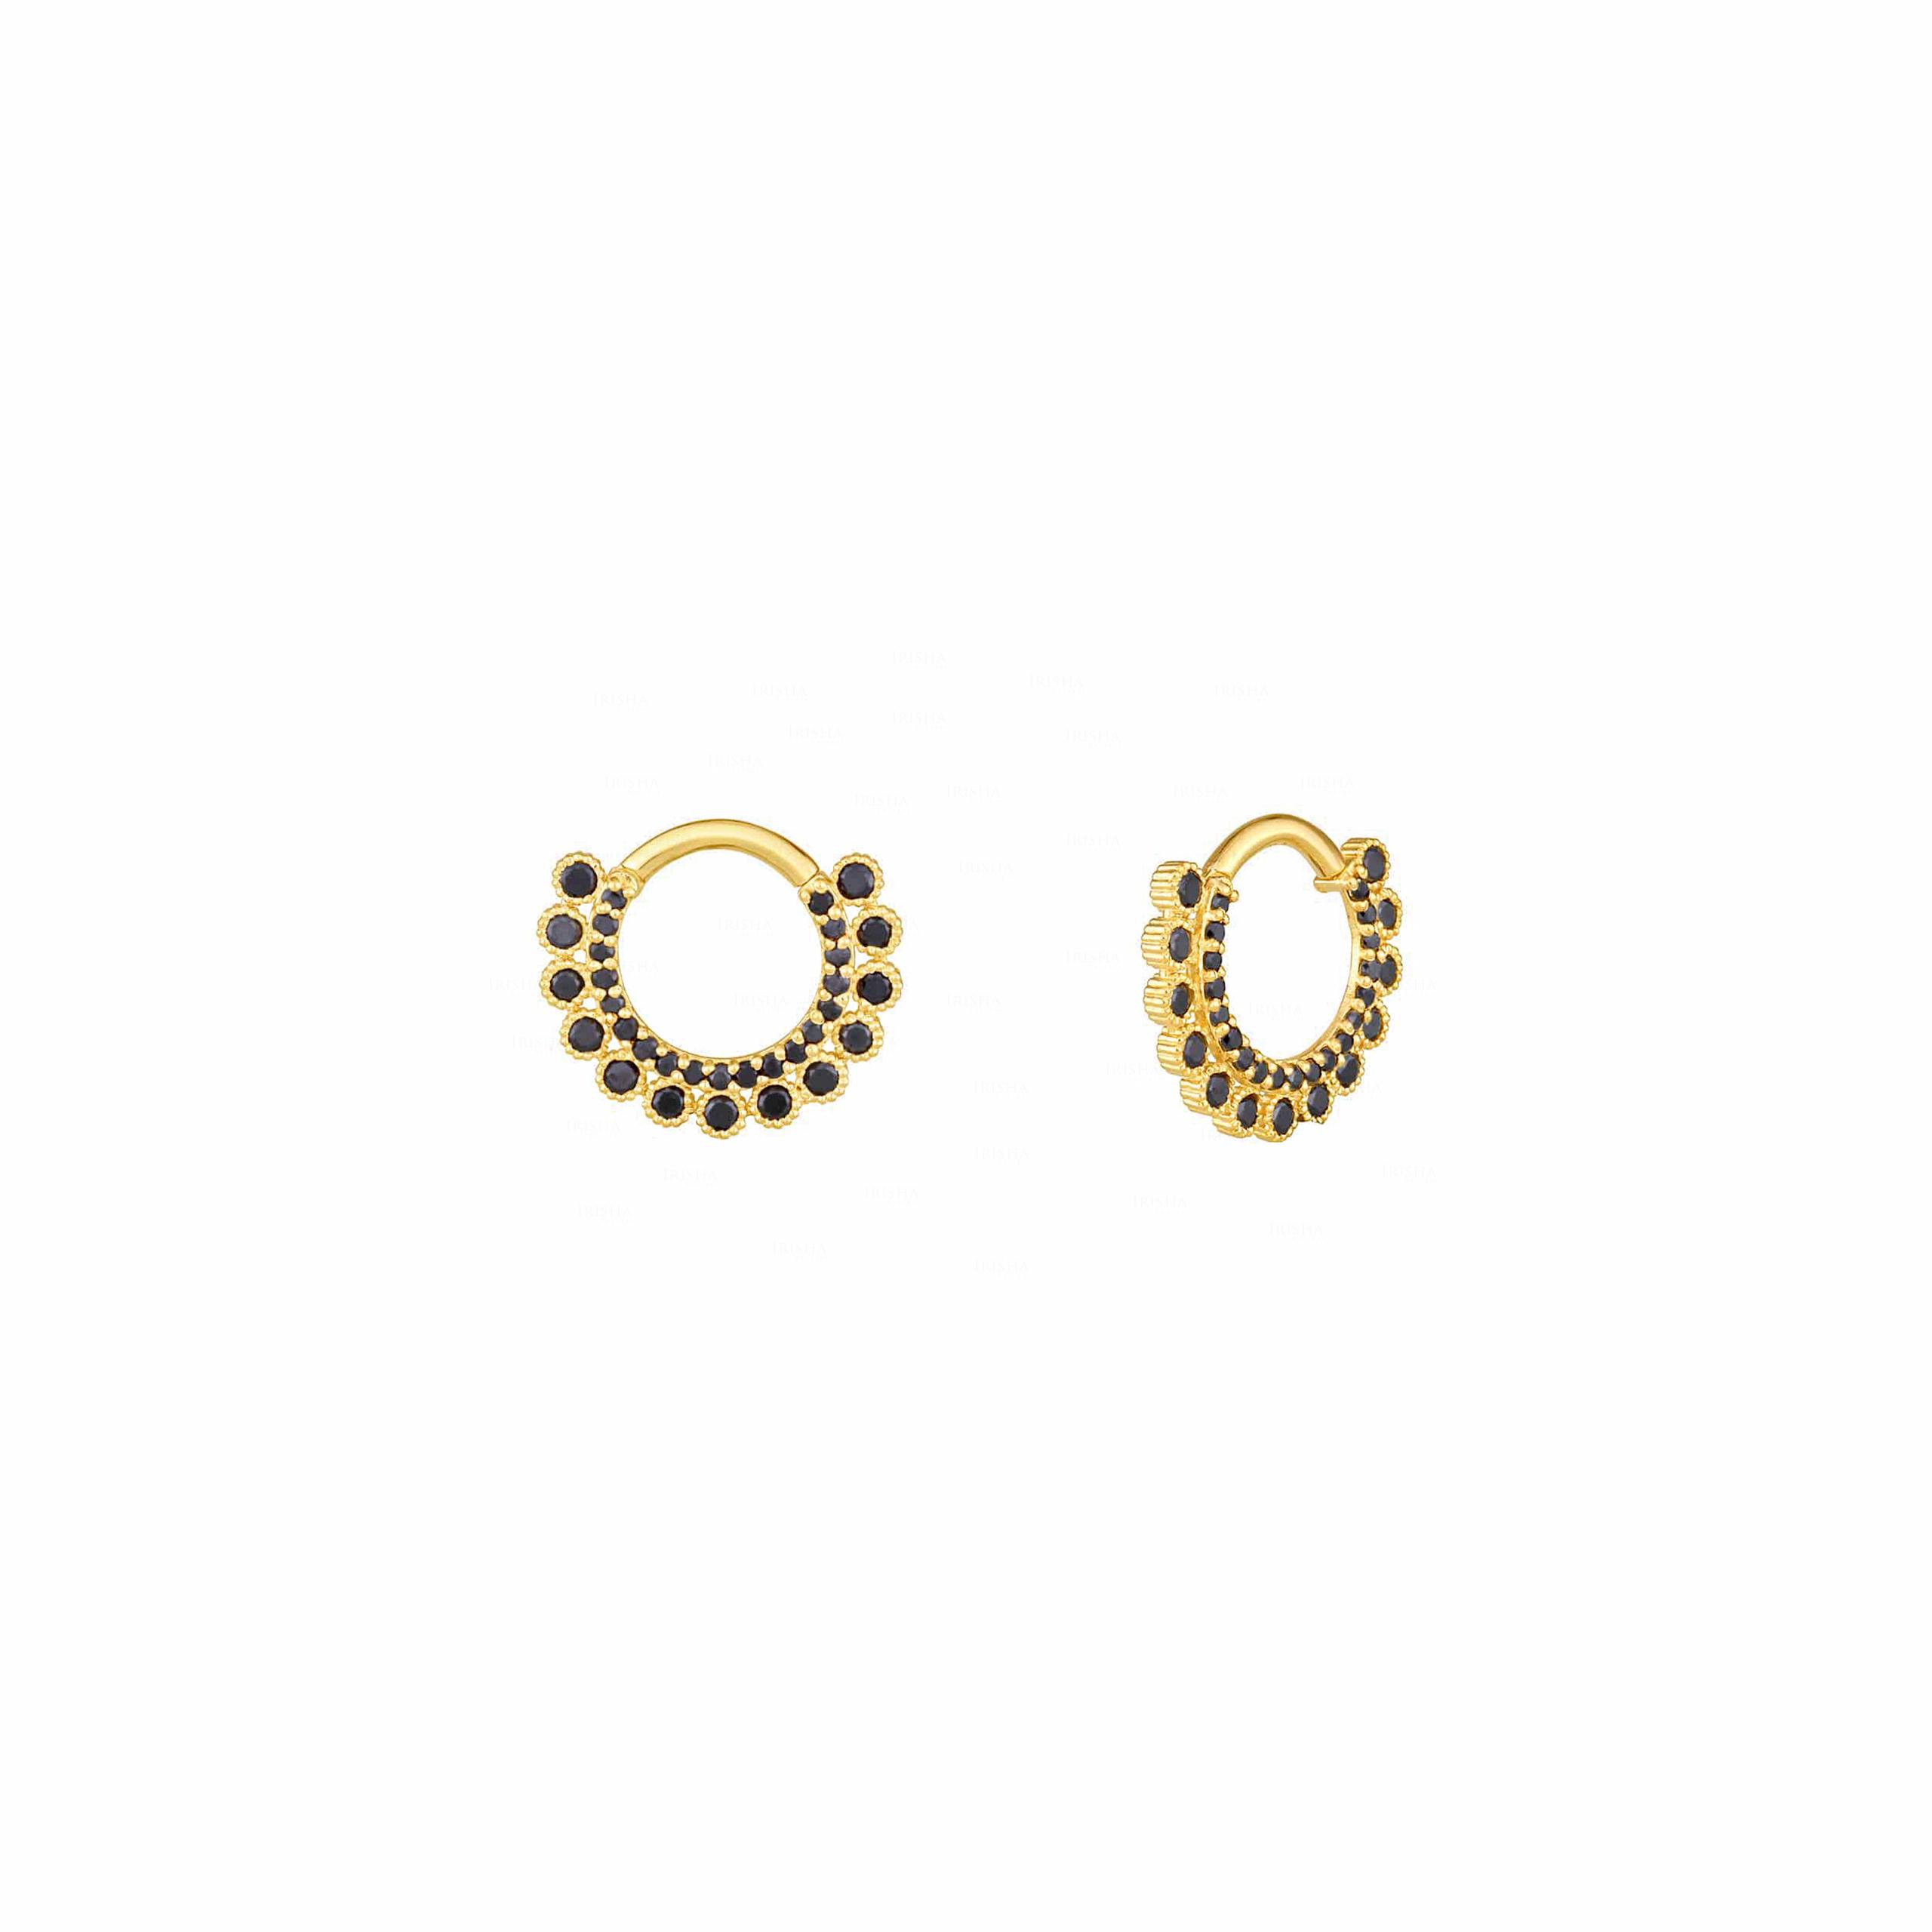 Ciara Earring | Black Diamond Huggie